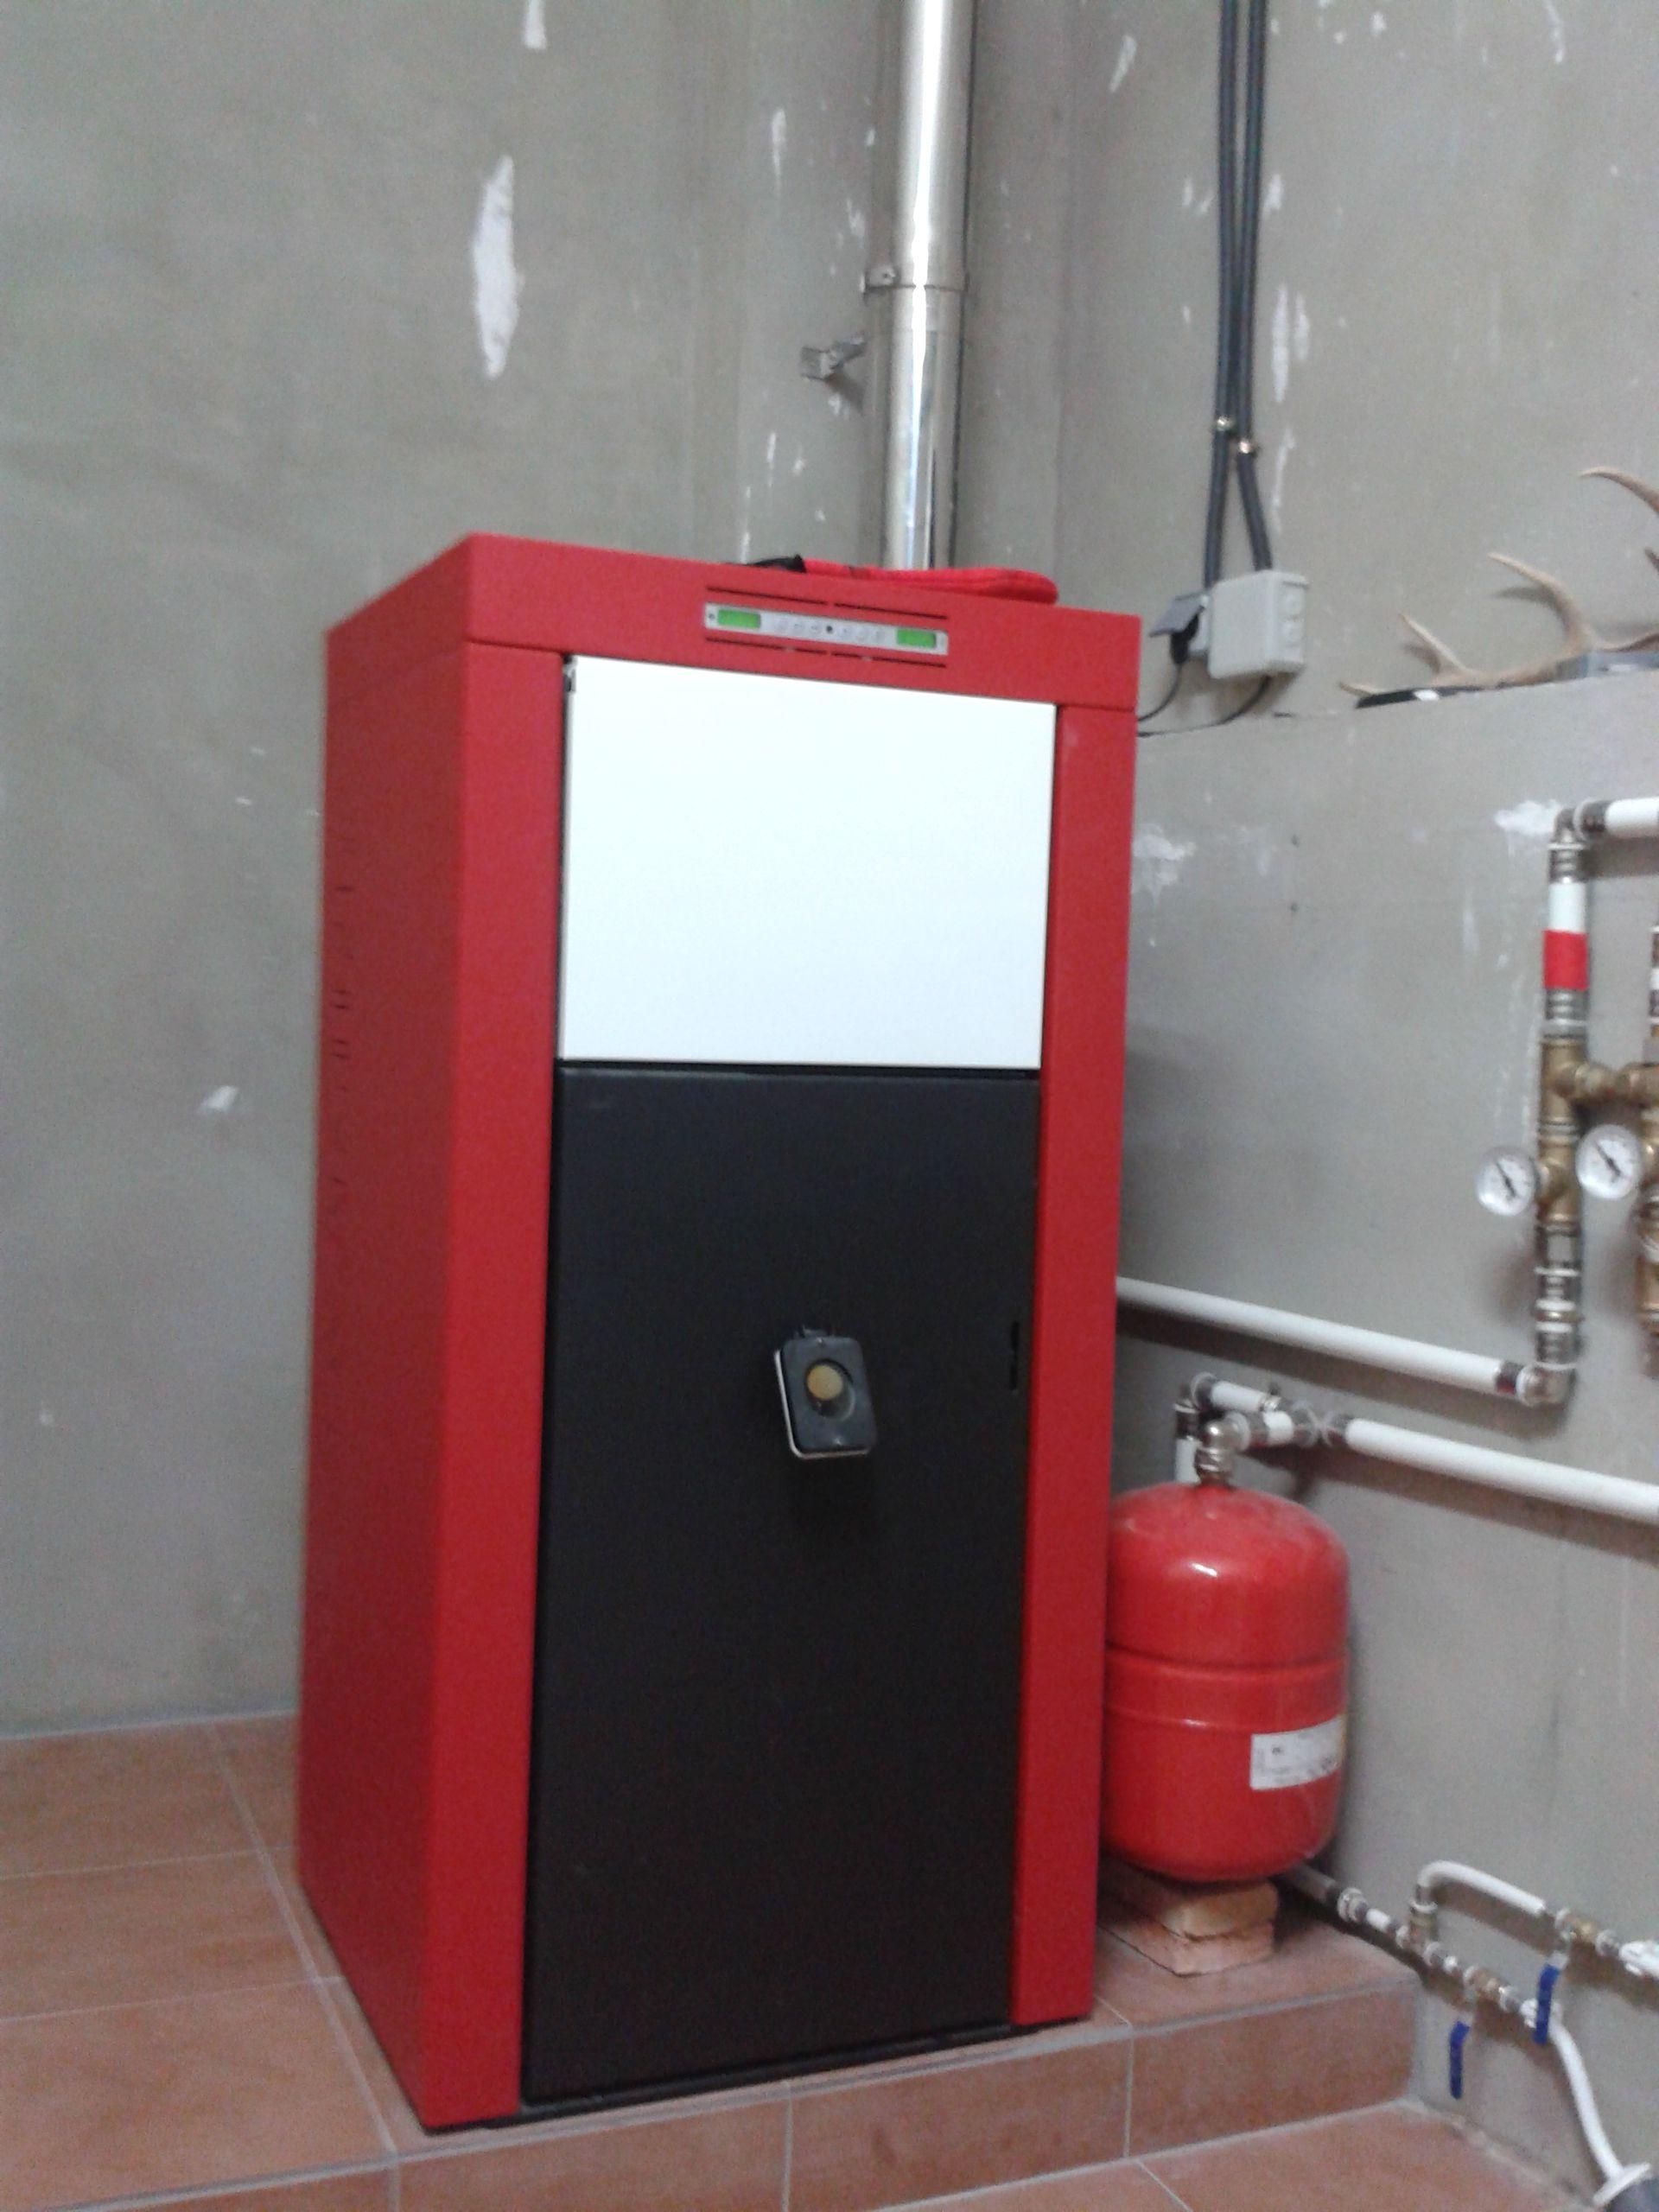 Caldera de pellet edilkamin basic para calefacci n por for Caldera de pellets para radiadores